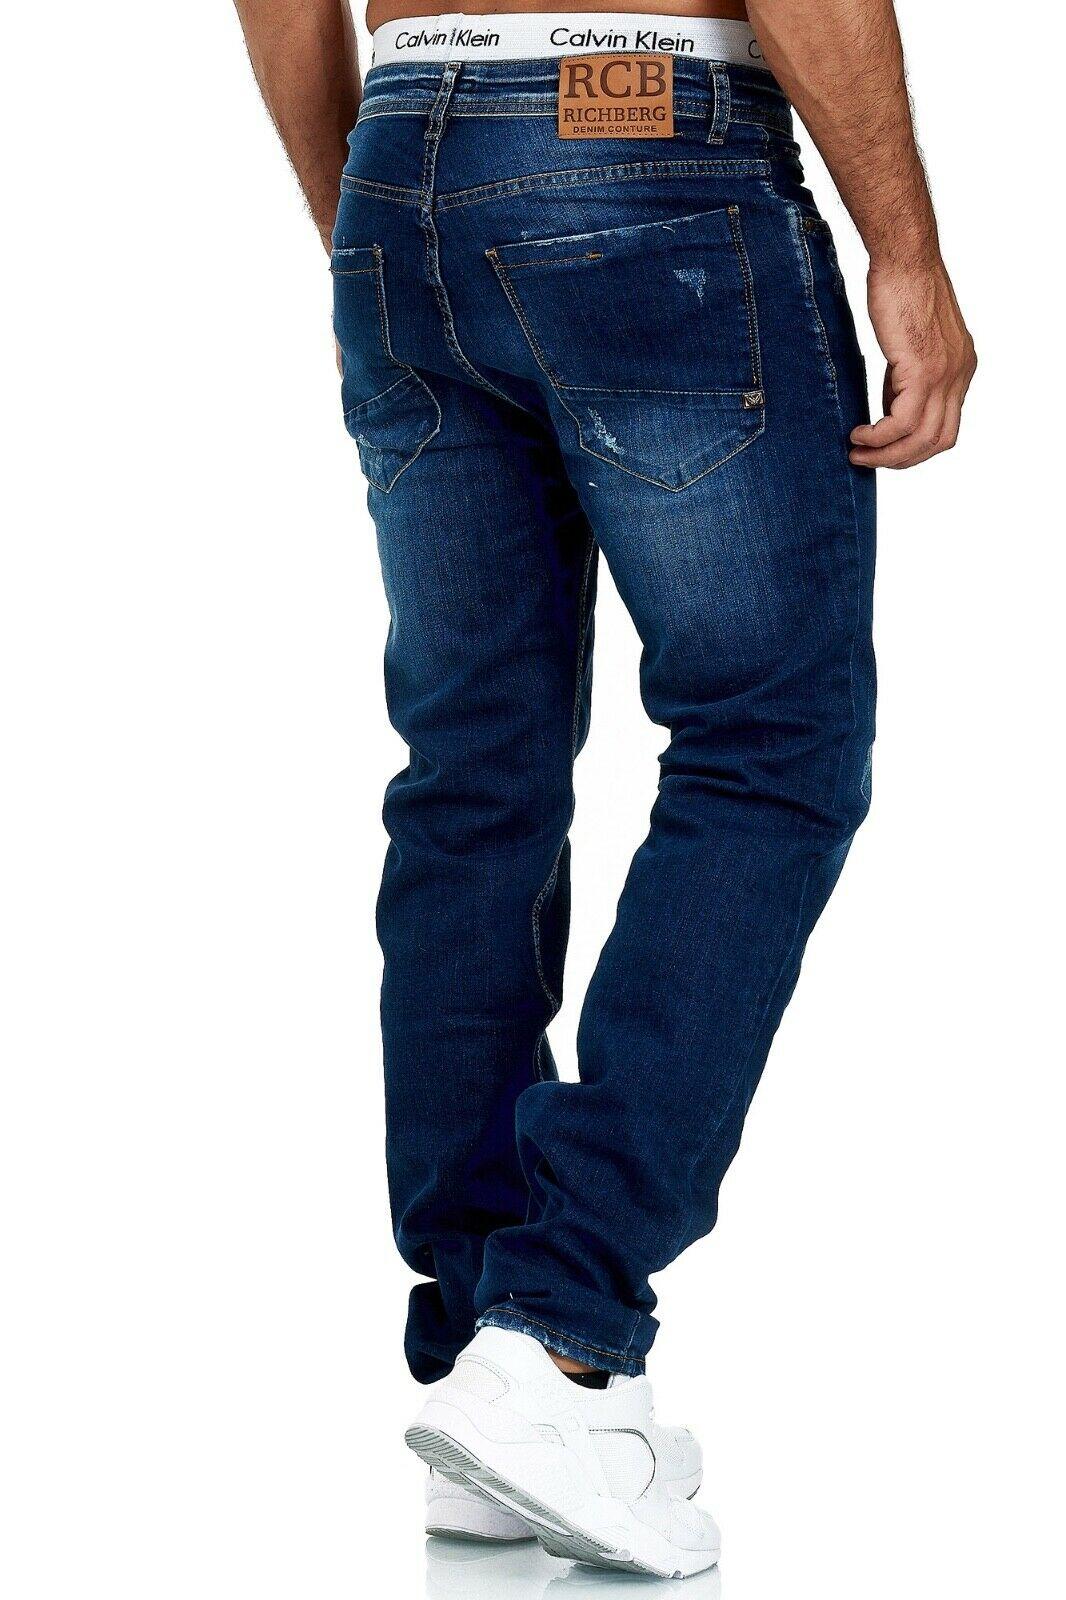 Herren-Jeans-Hose-Denim-KC-Black-Washed-Straight-Cut-Regular-Dicke-Naht-naehte Indexbild 59